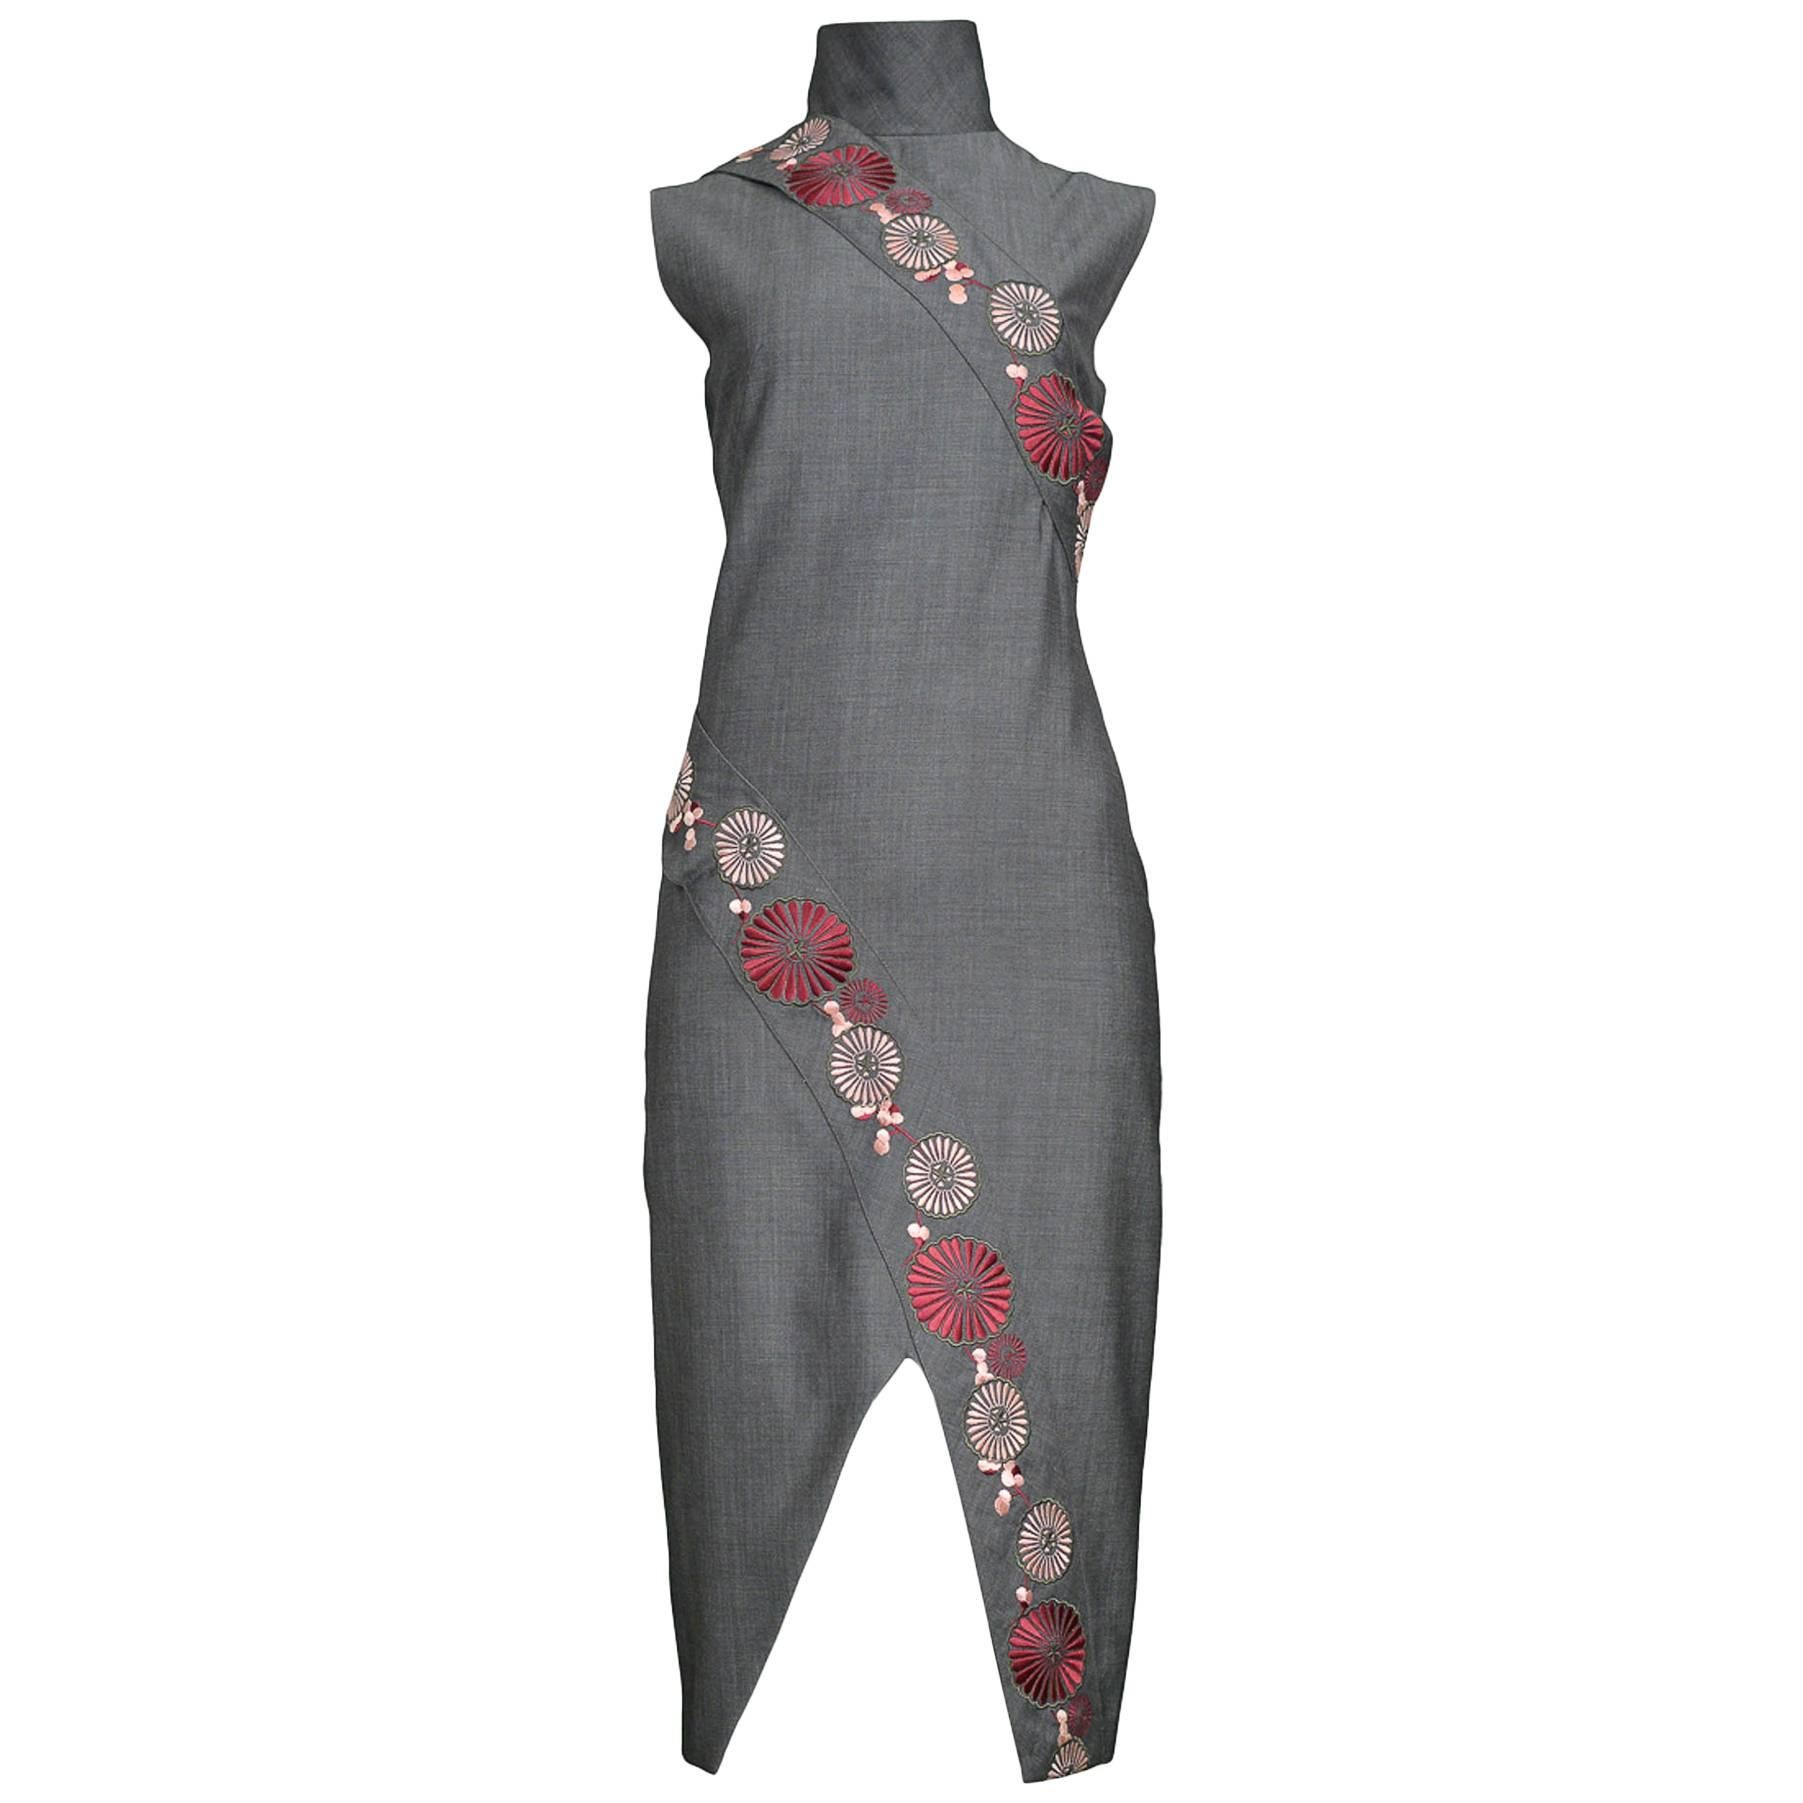 Vintage Runway Alexander McQueen 2001 Floral Cheongsam Inspired Dress